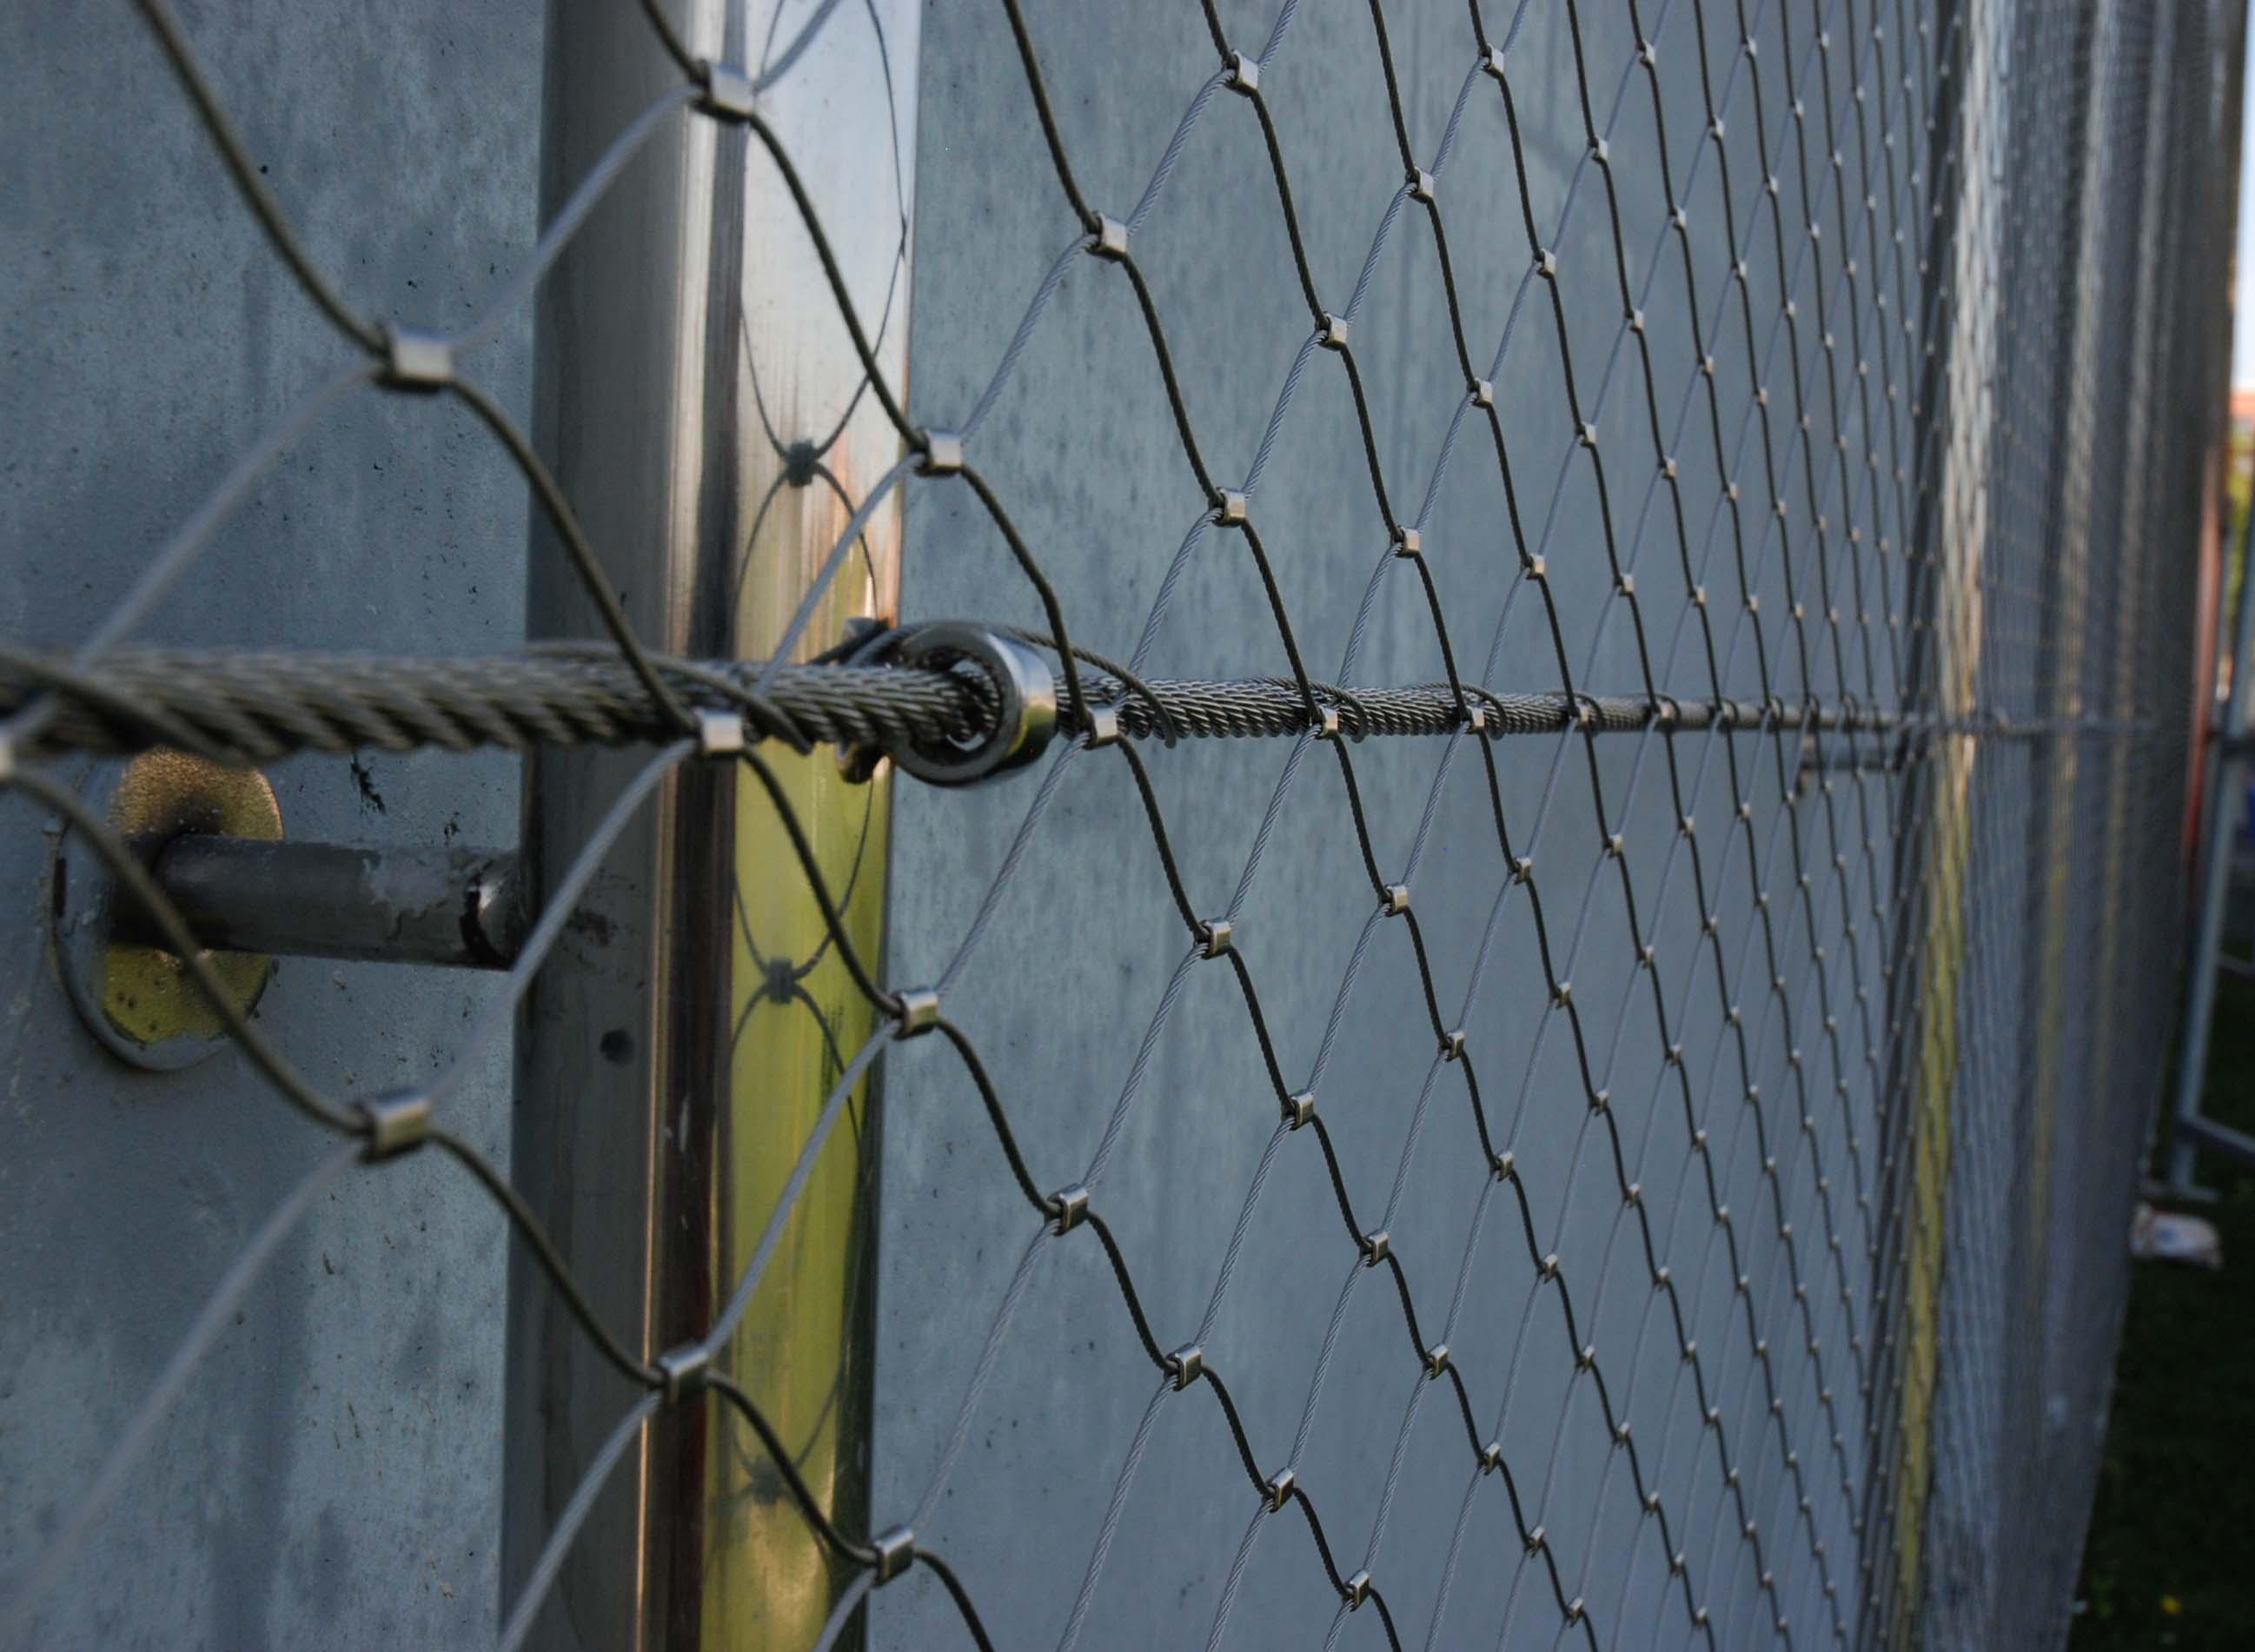 campo de fútbol martorell relleno de malla de cables